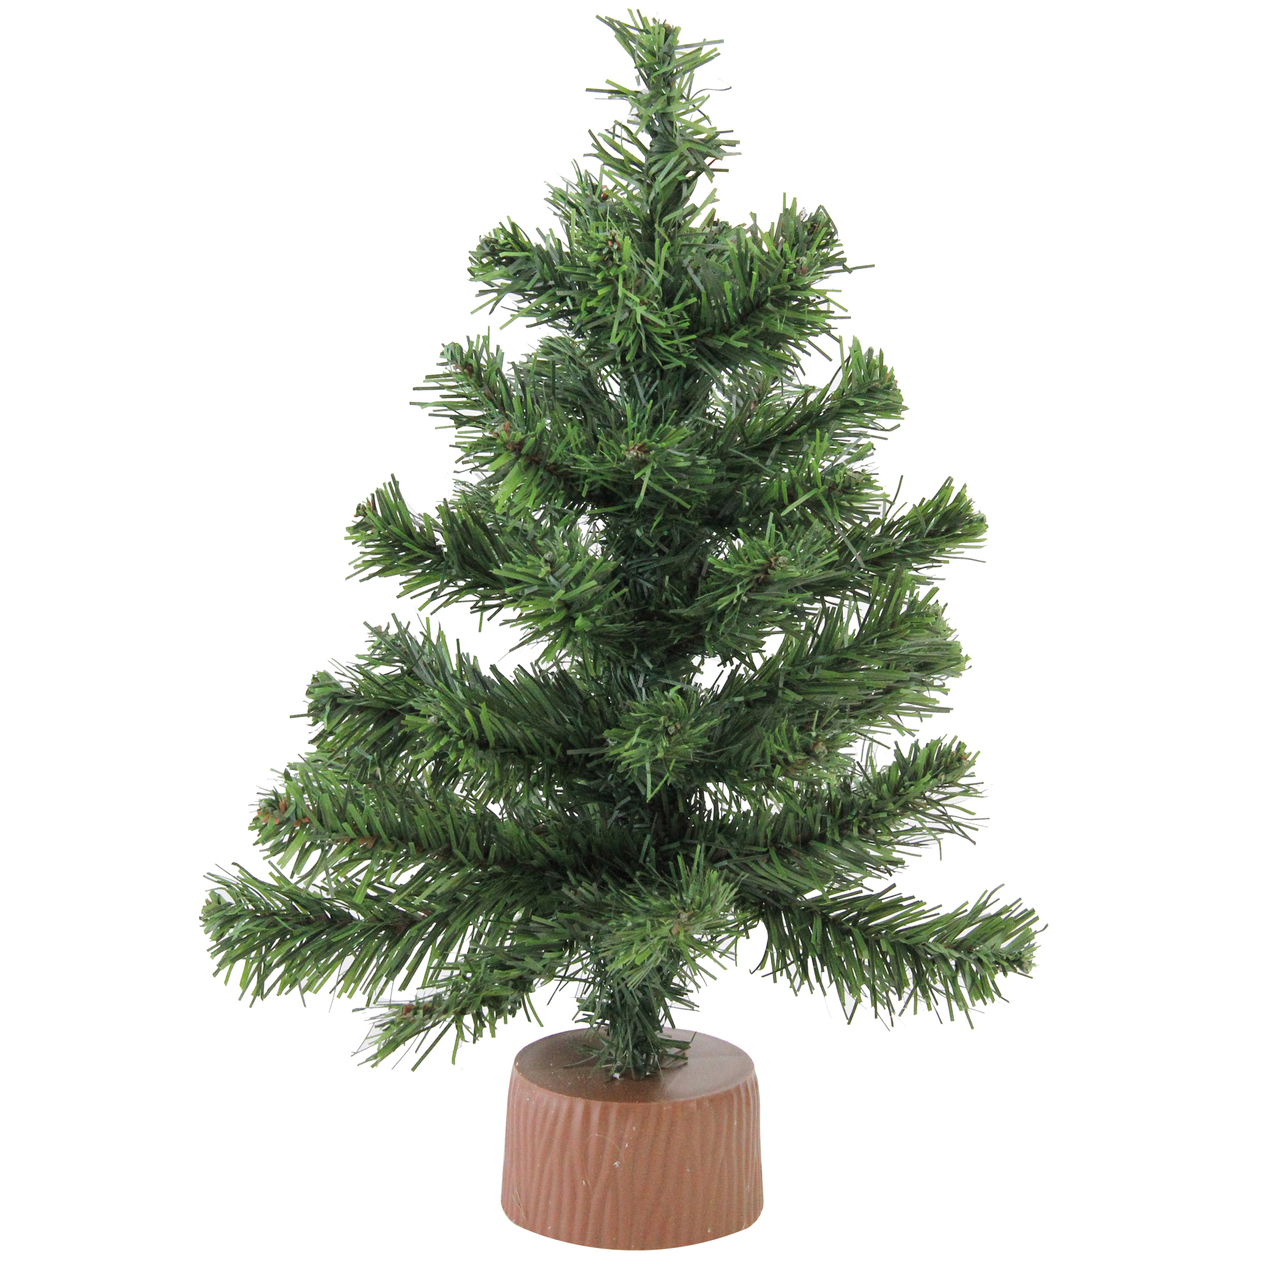 12 Mini Canadian Pine Artificial Christmas Tree In Faux Wood Base  - Artificial Mini Christmas Trees